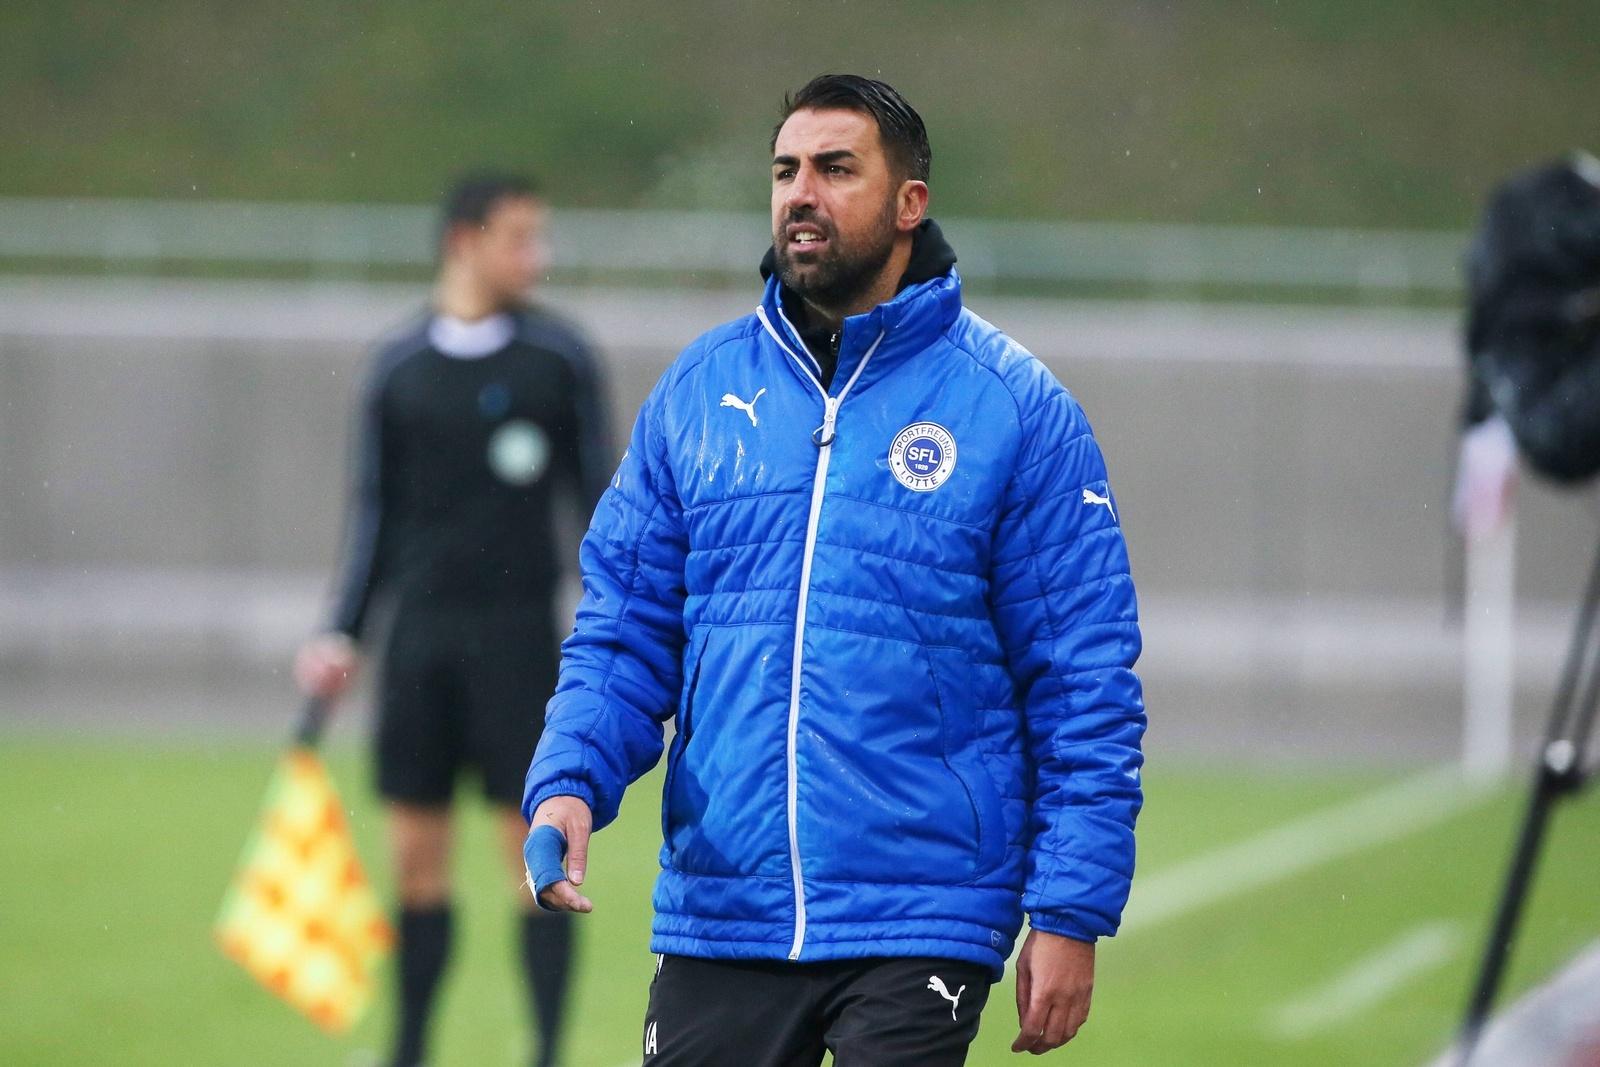 Ismail Atalan, Coach der Sportfreunde Lotte.